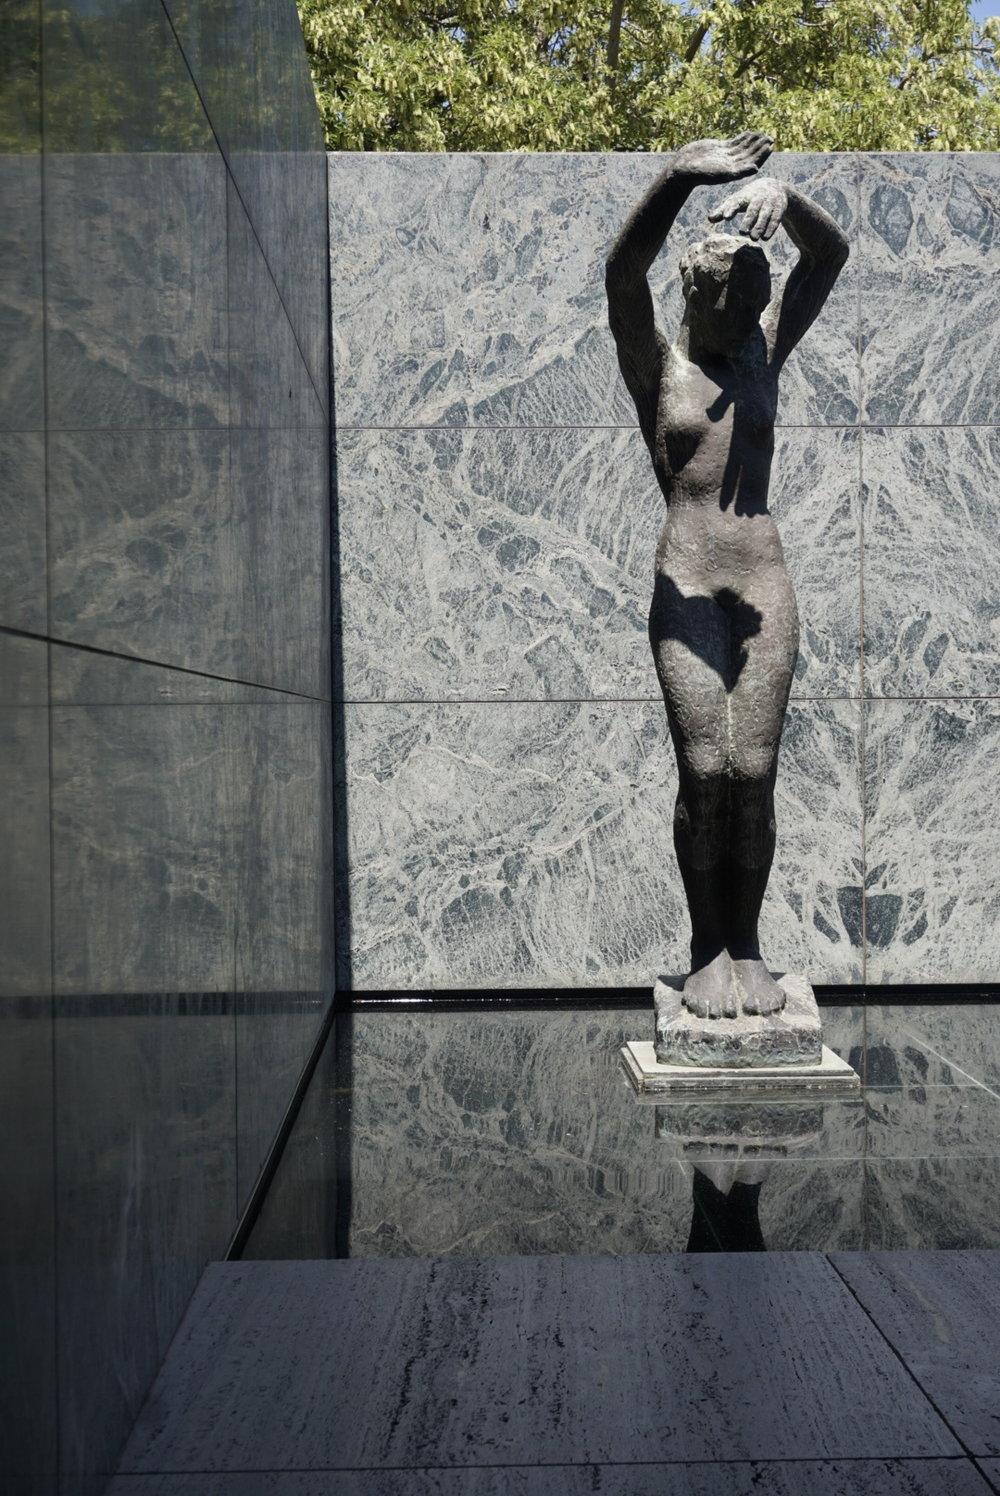 Barcelona Pavilion, Ludwig Mies can der Rohe, Barcelona, Spain © 2016 David Harrop